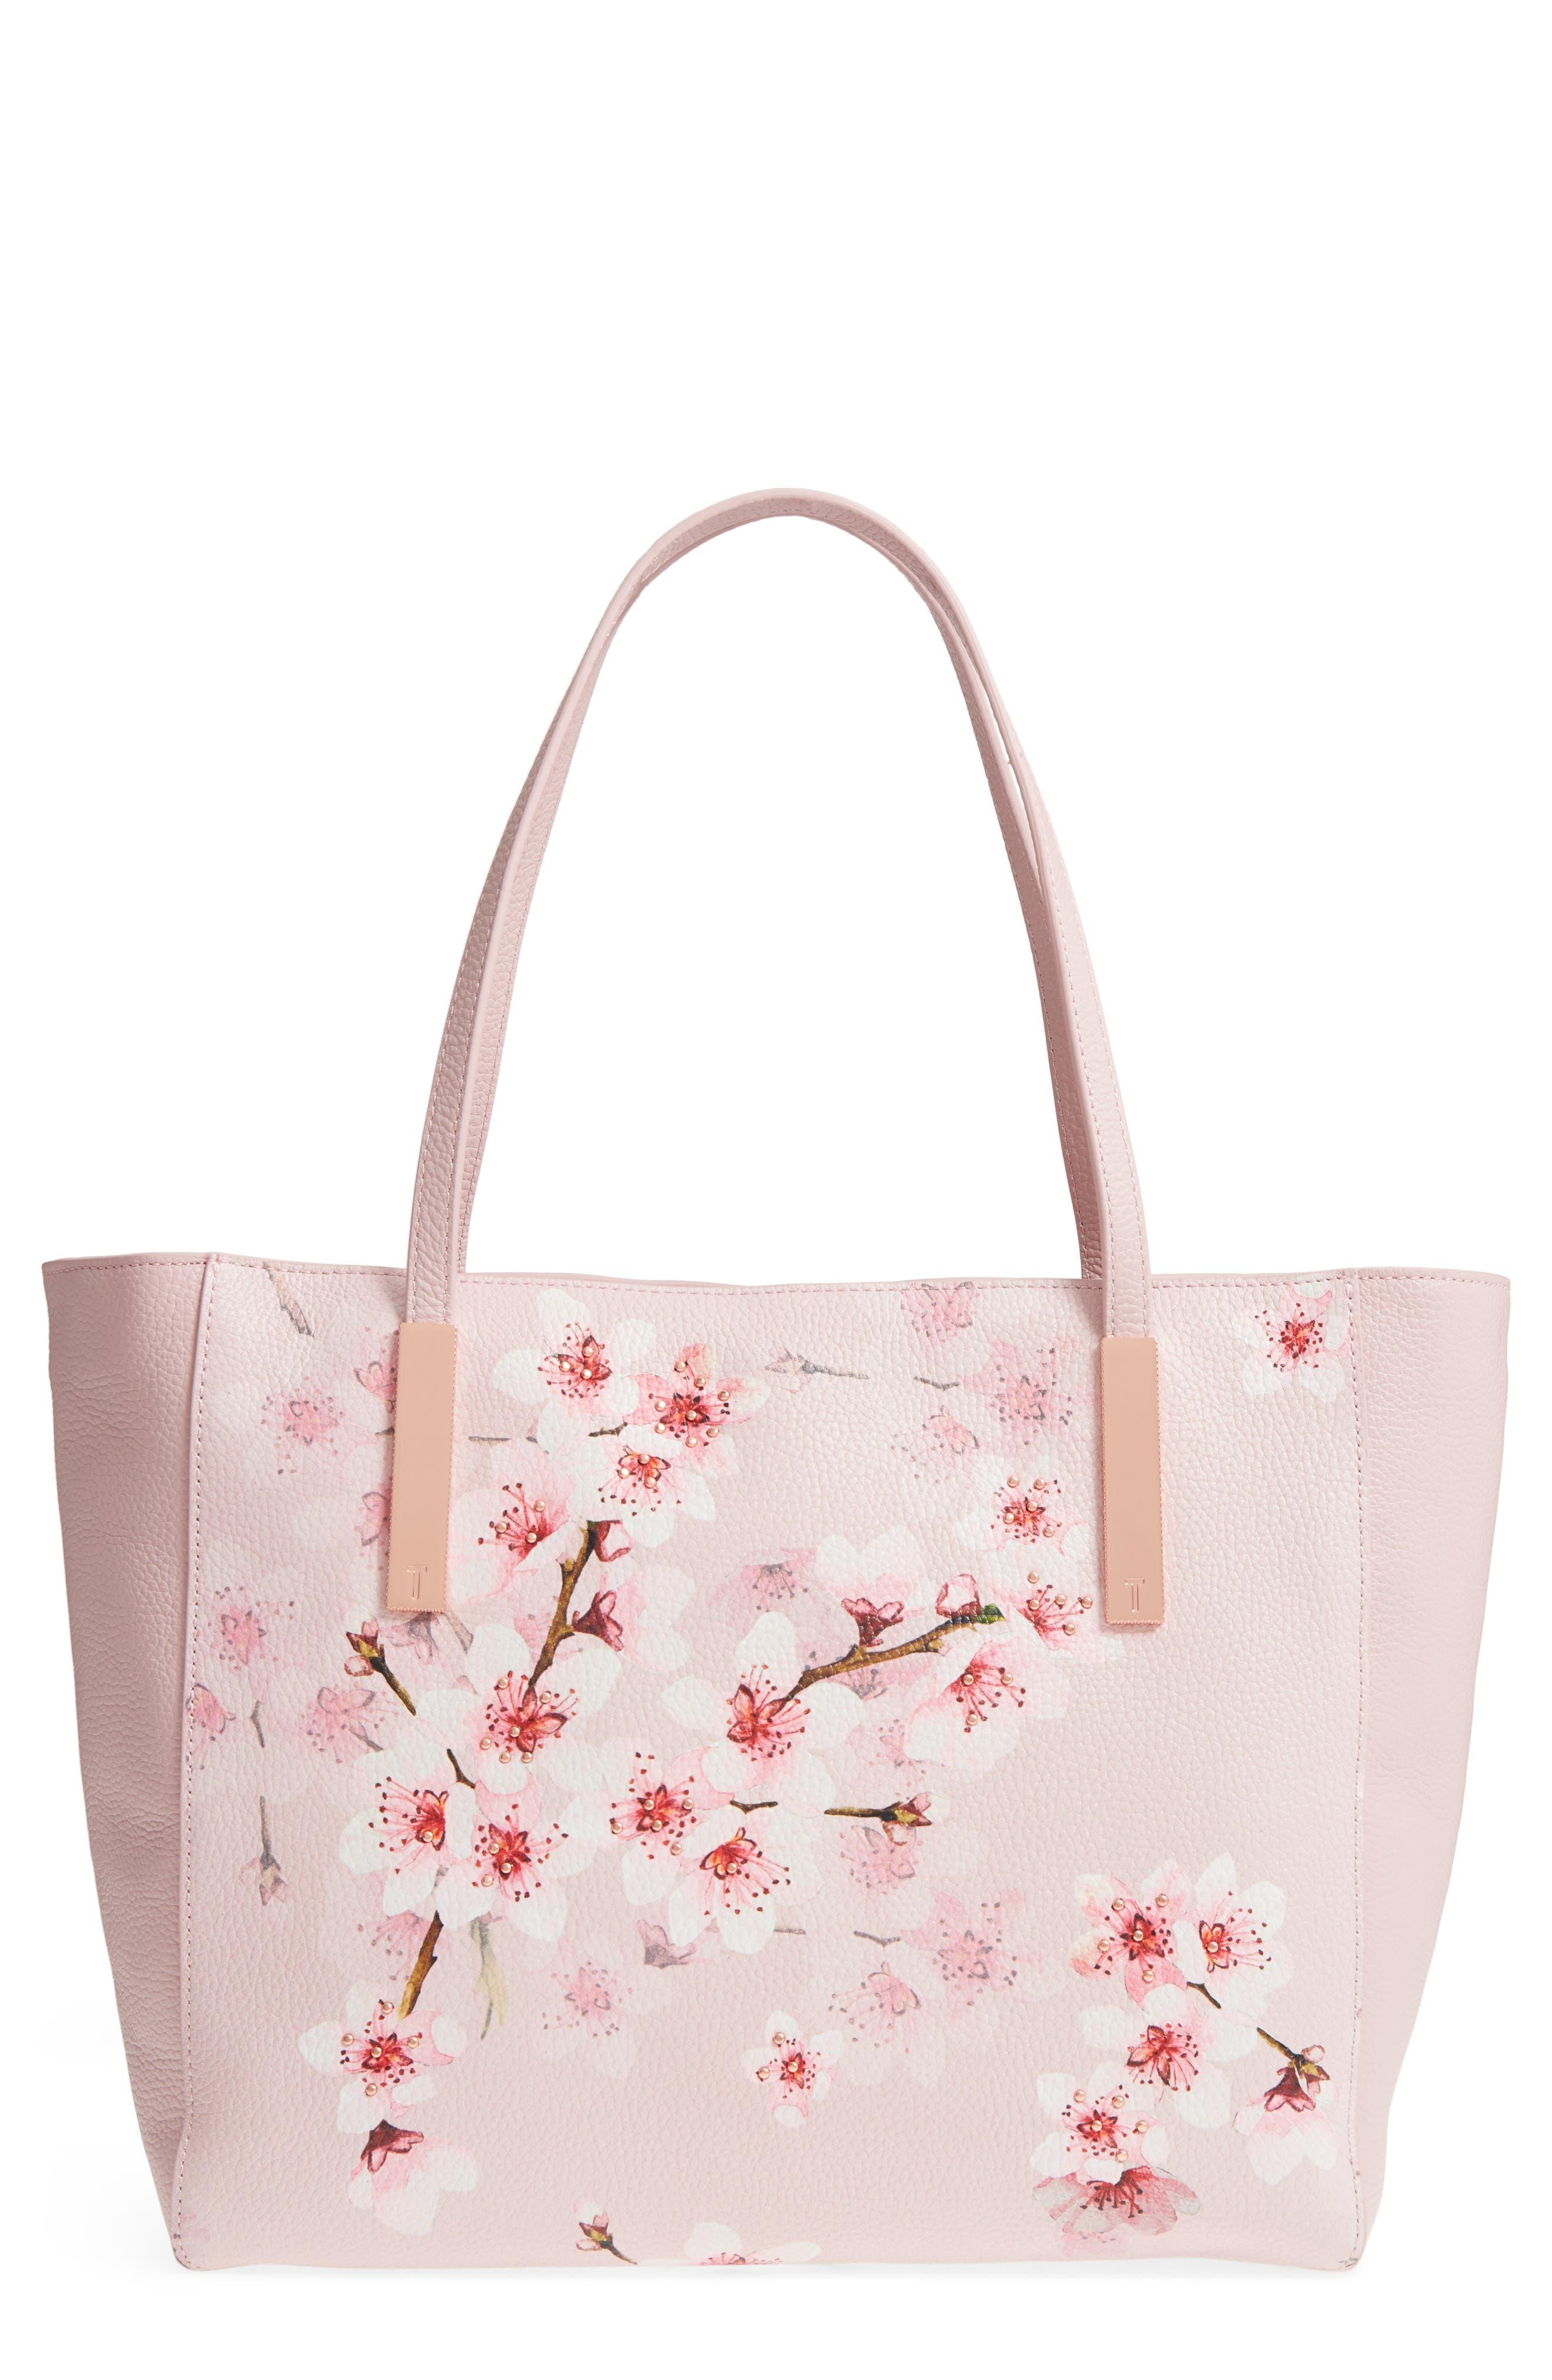 Soft Blossom Leather Shopper,                         Main,                         color, Light Pink